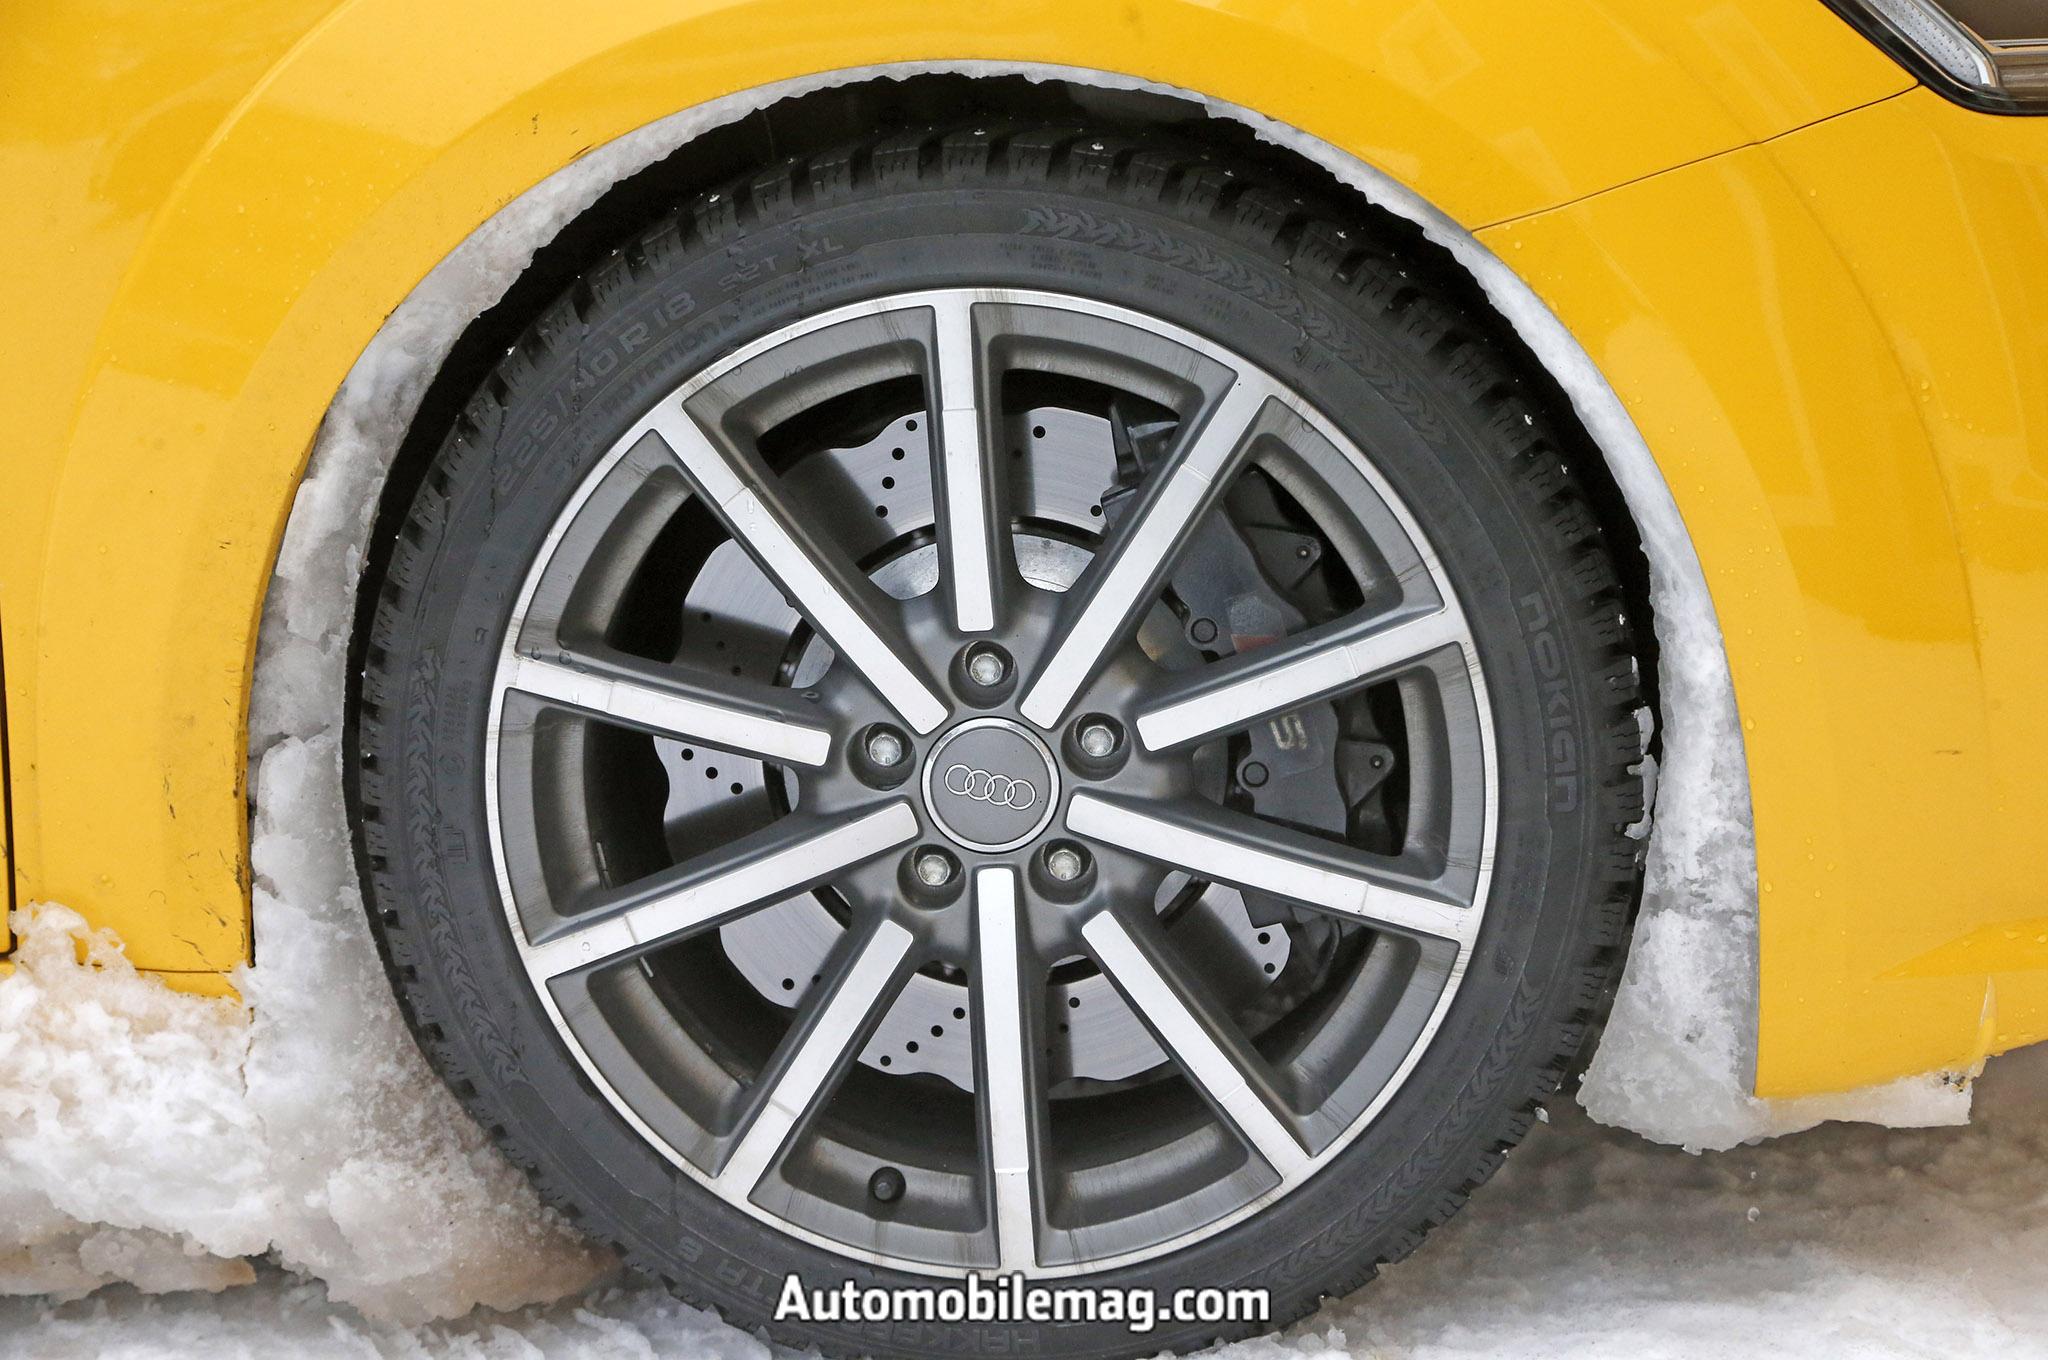 NextGen Audi TT RS Spied Winter Testing With Manual Transmission - Audi tt manual transmission